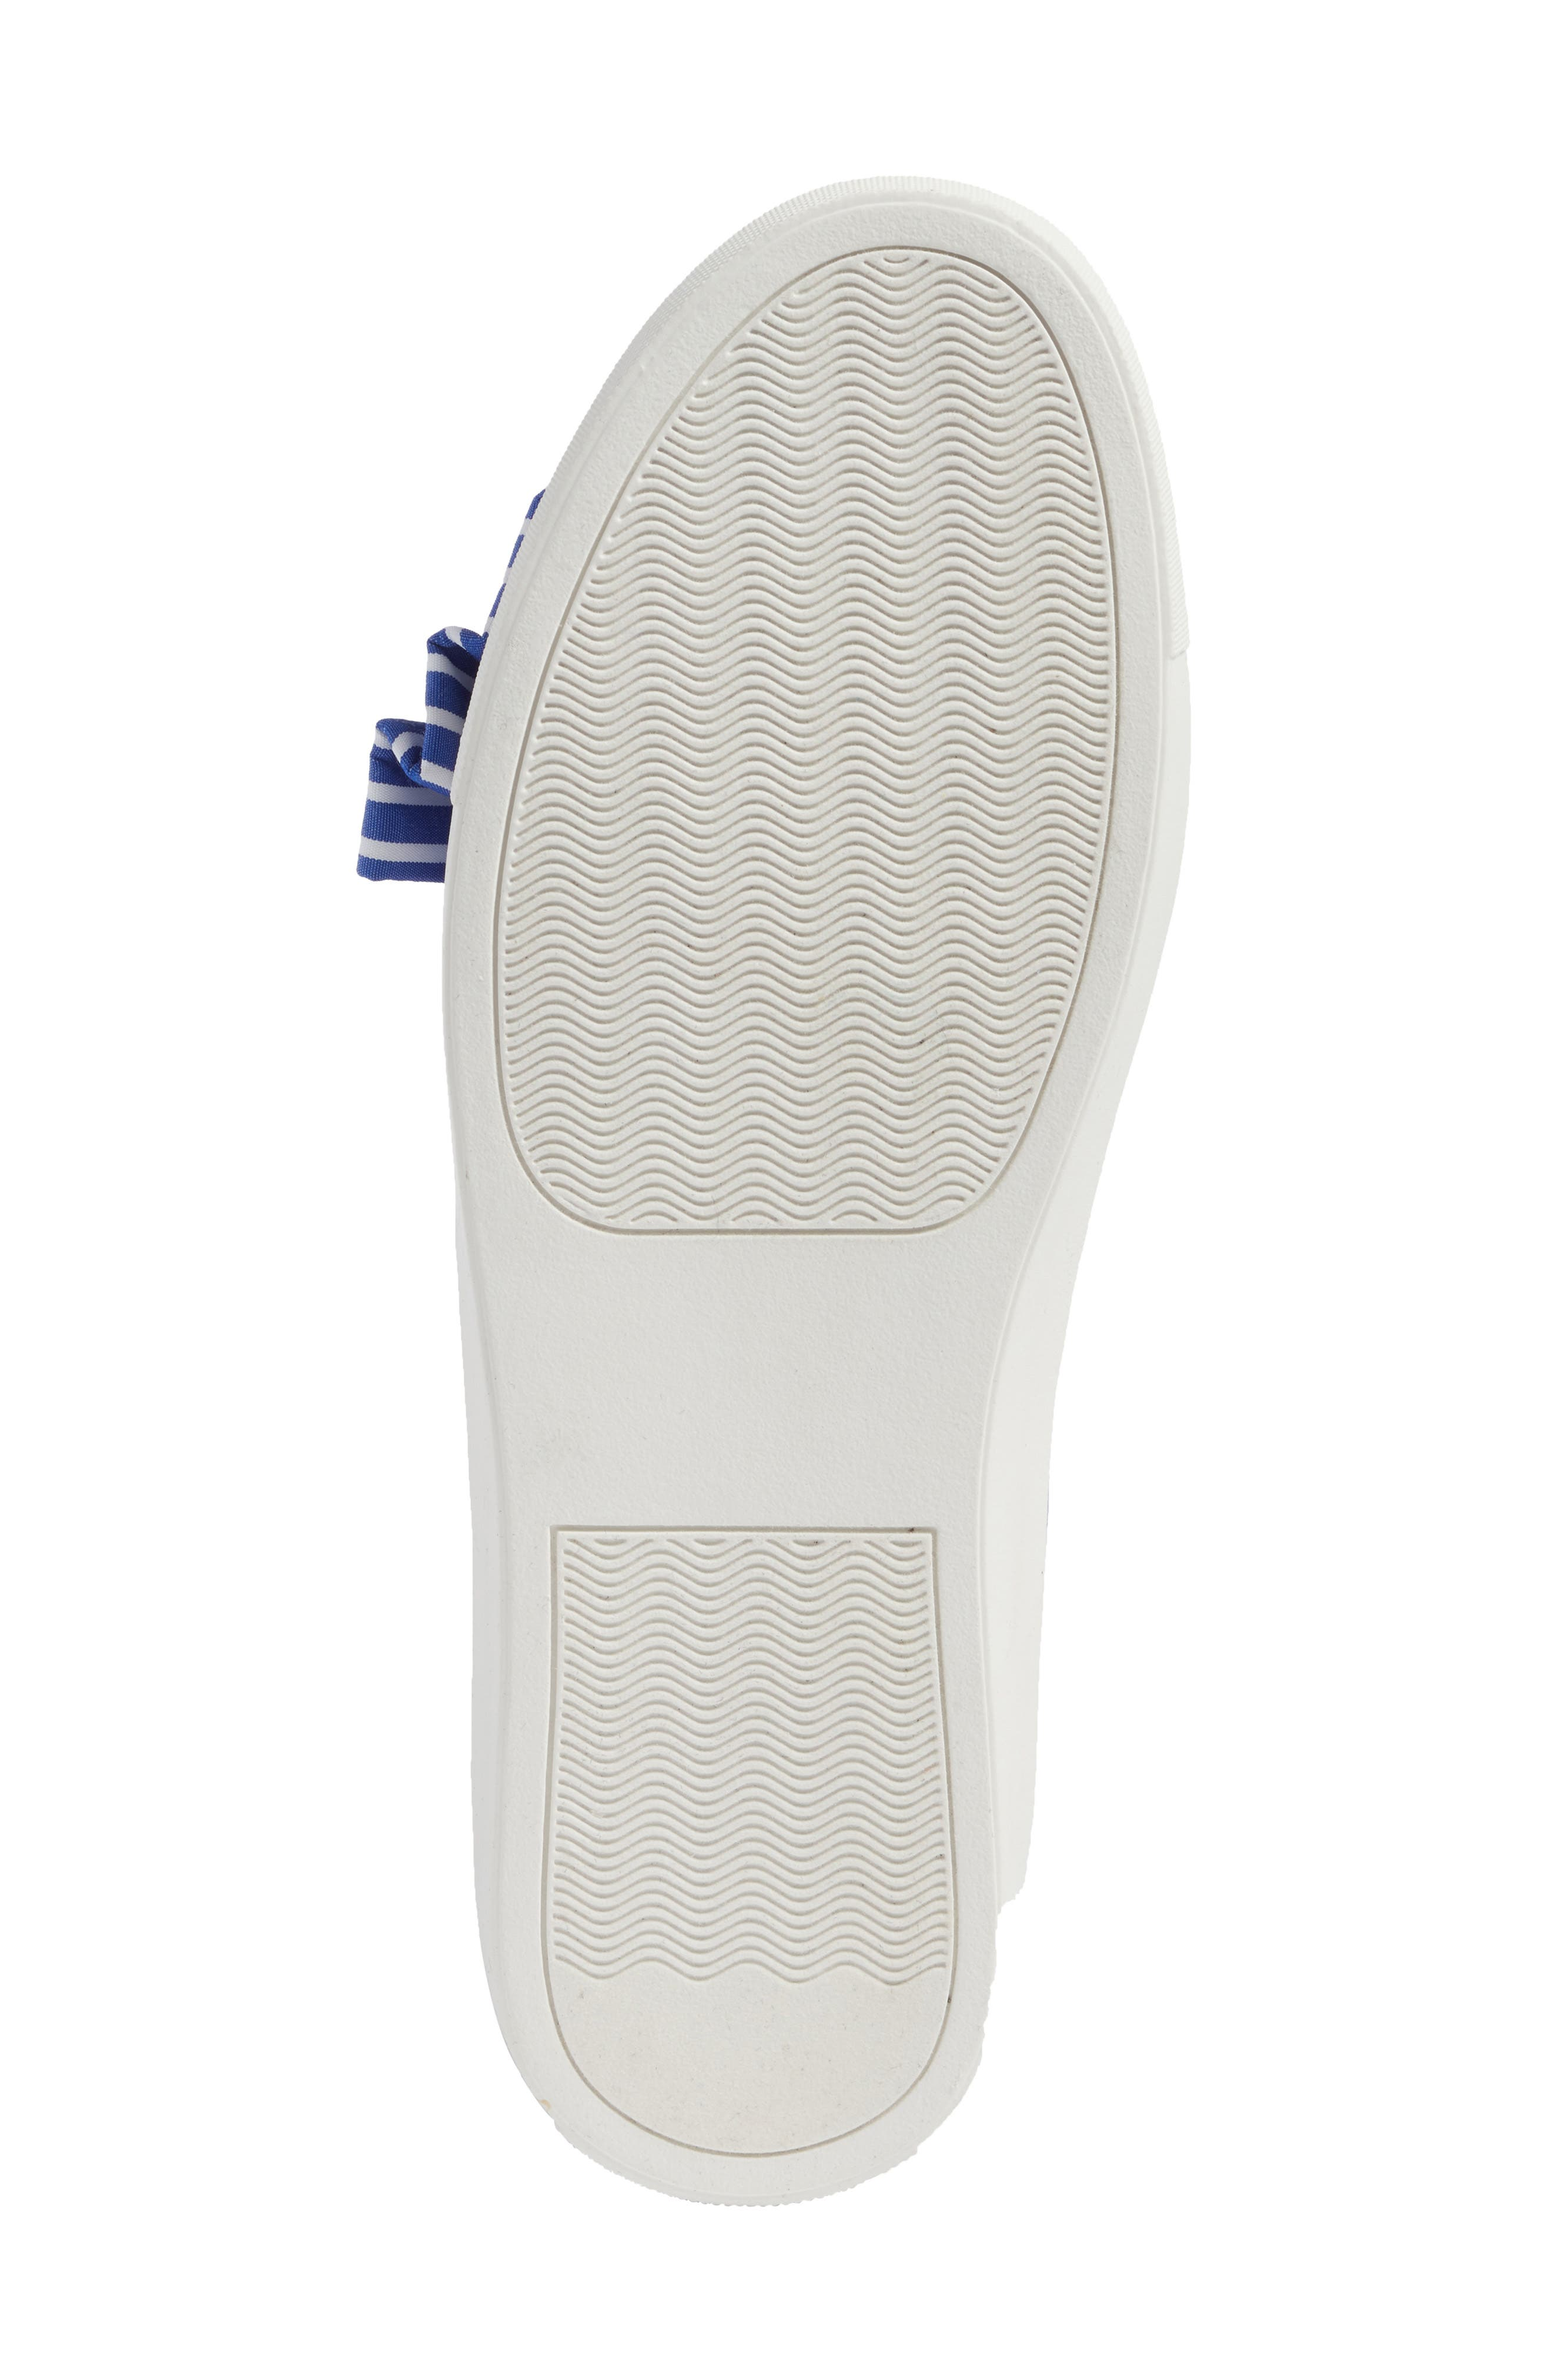 Mika Slip-On Sneaker,                             Alternate thumbnail 8, color,                             Blue Shirting Fabric